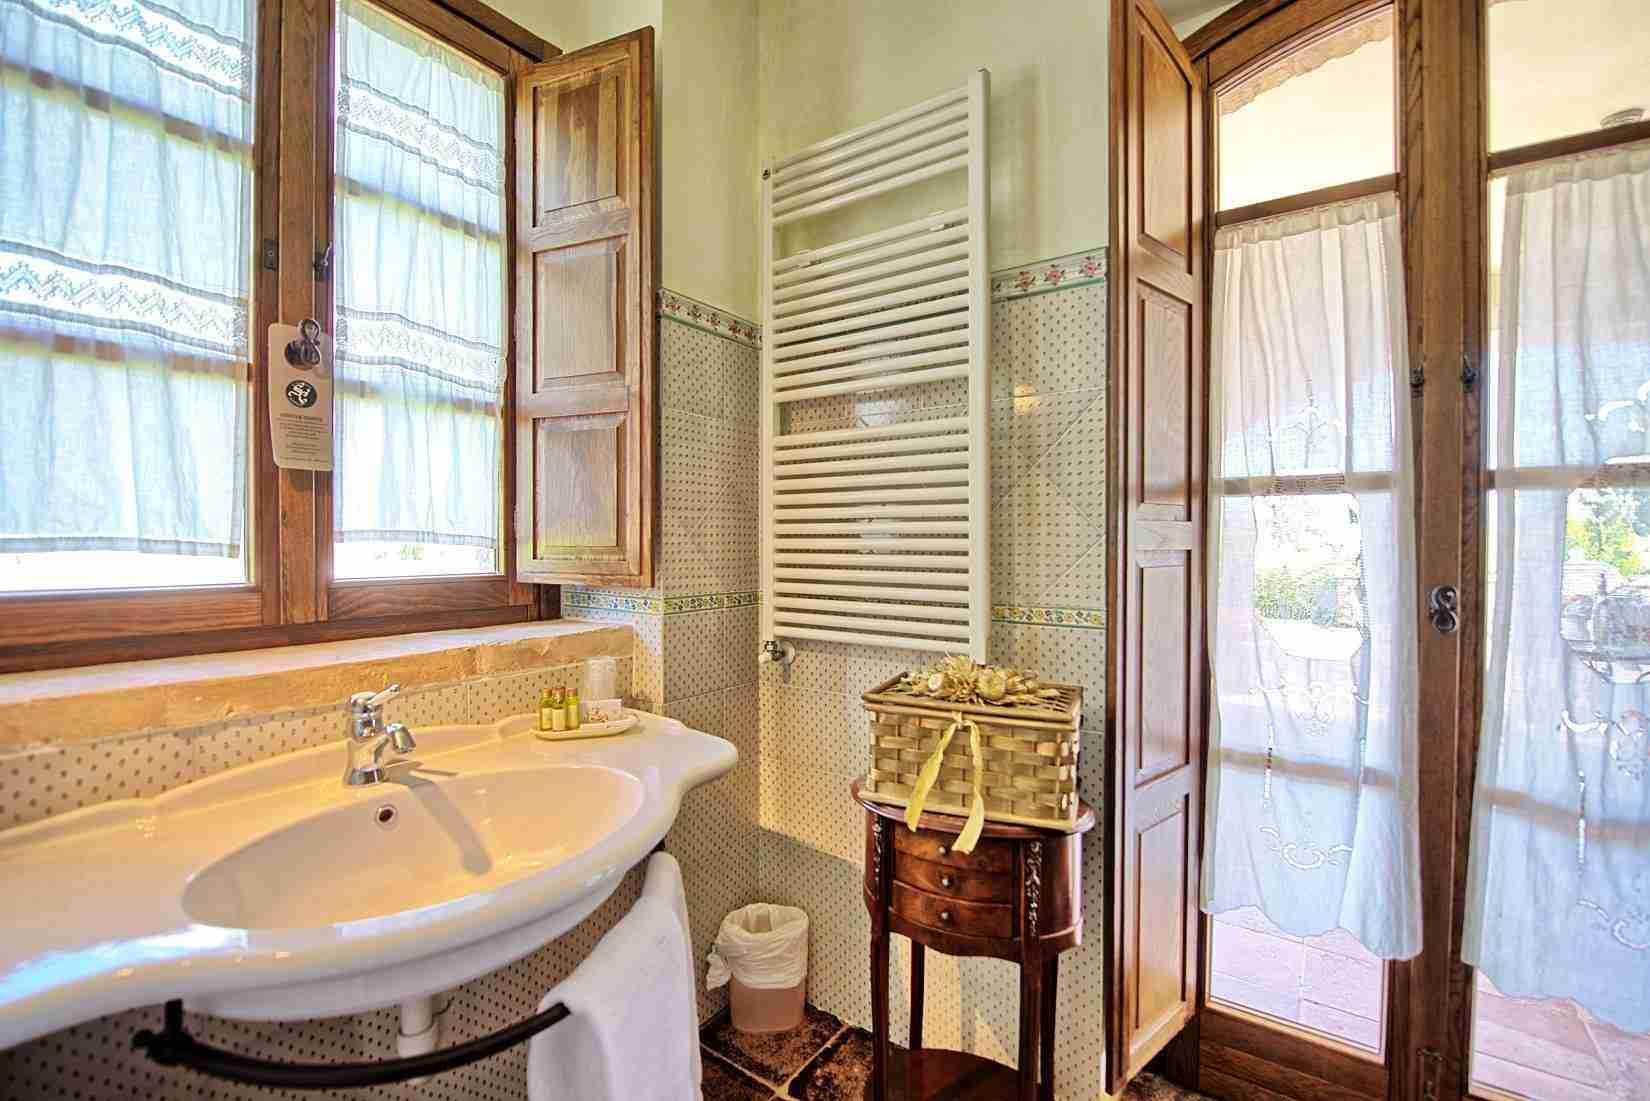 32 Assisi bathroom